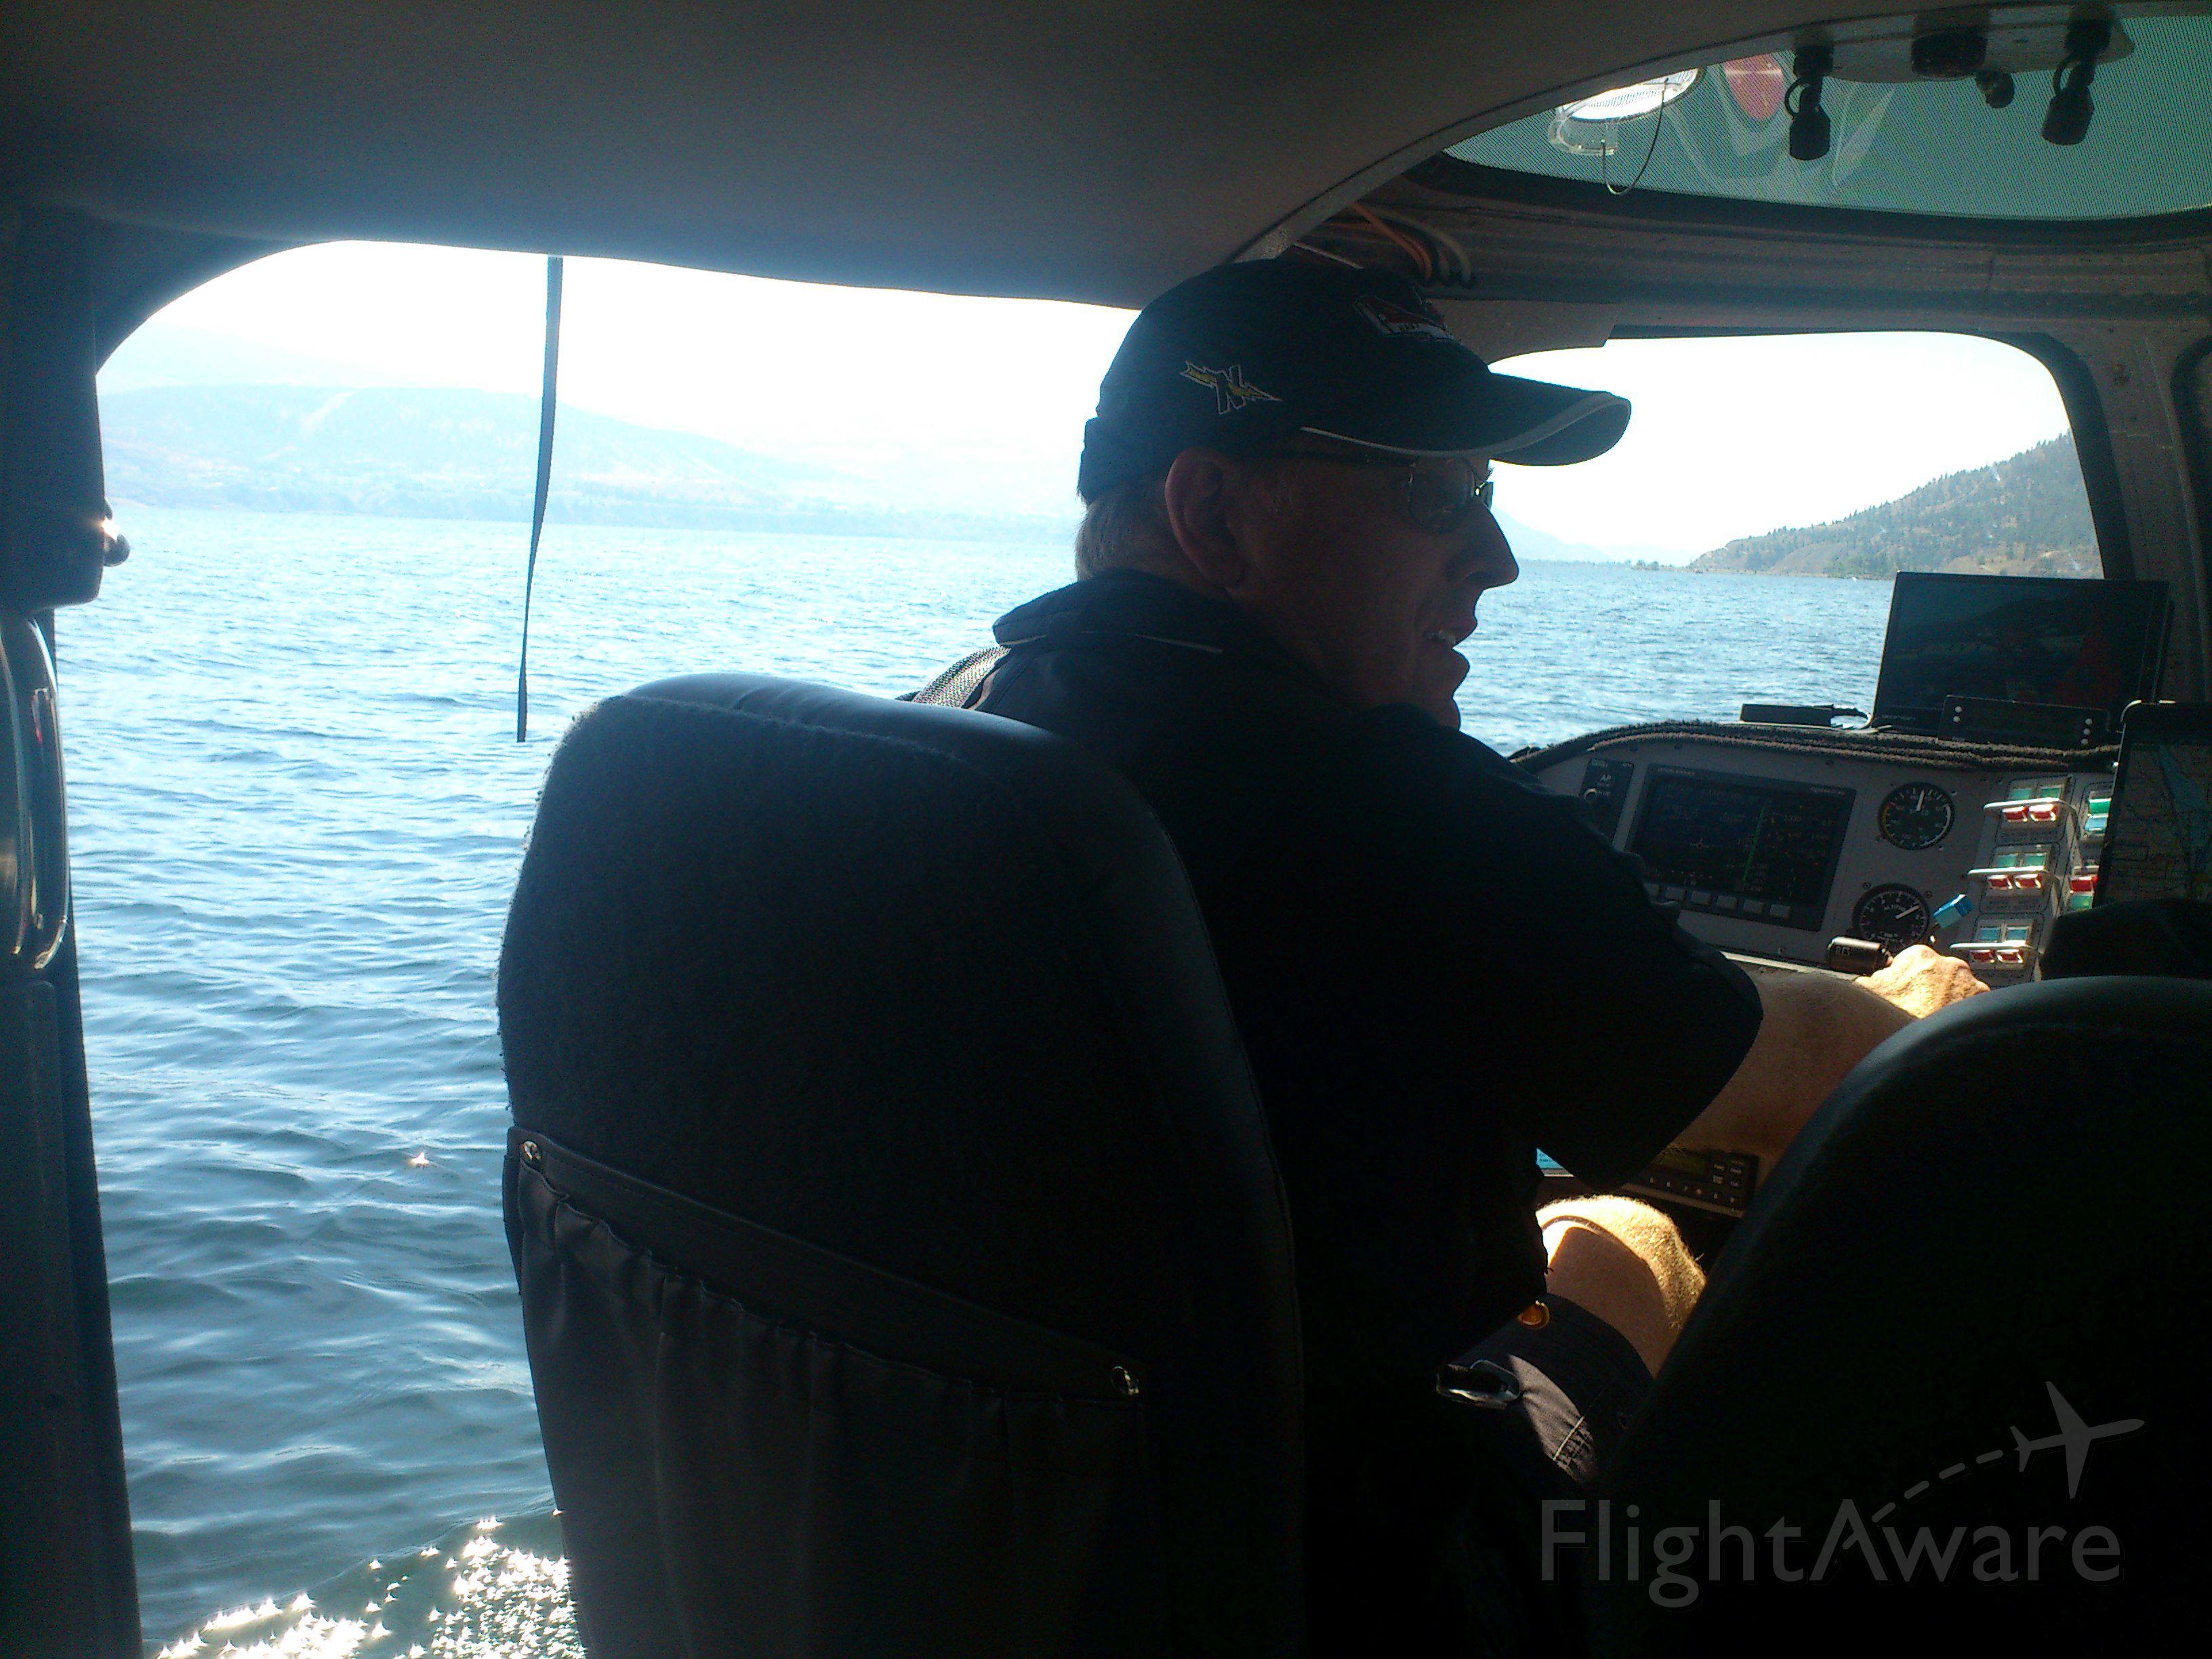 REPUBLIC Seabee (N64PN) - Water-taxi on Okanagan Lake. Penticton Airport, Canada CYYF Aug 2013. Republic R-34 Seabee